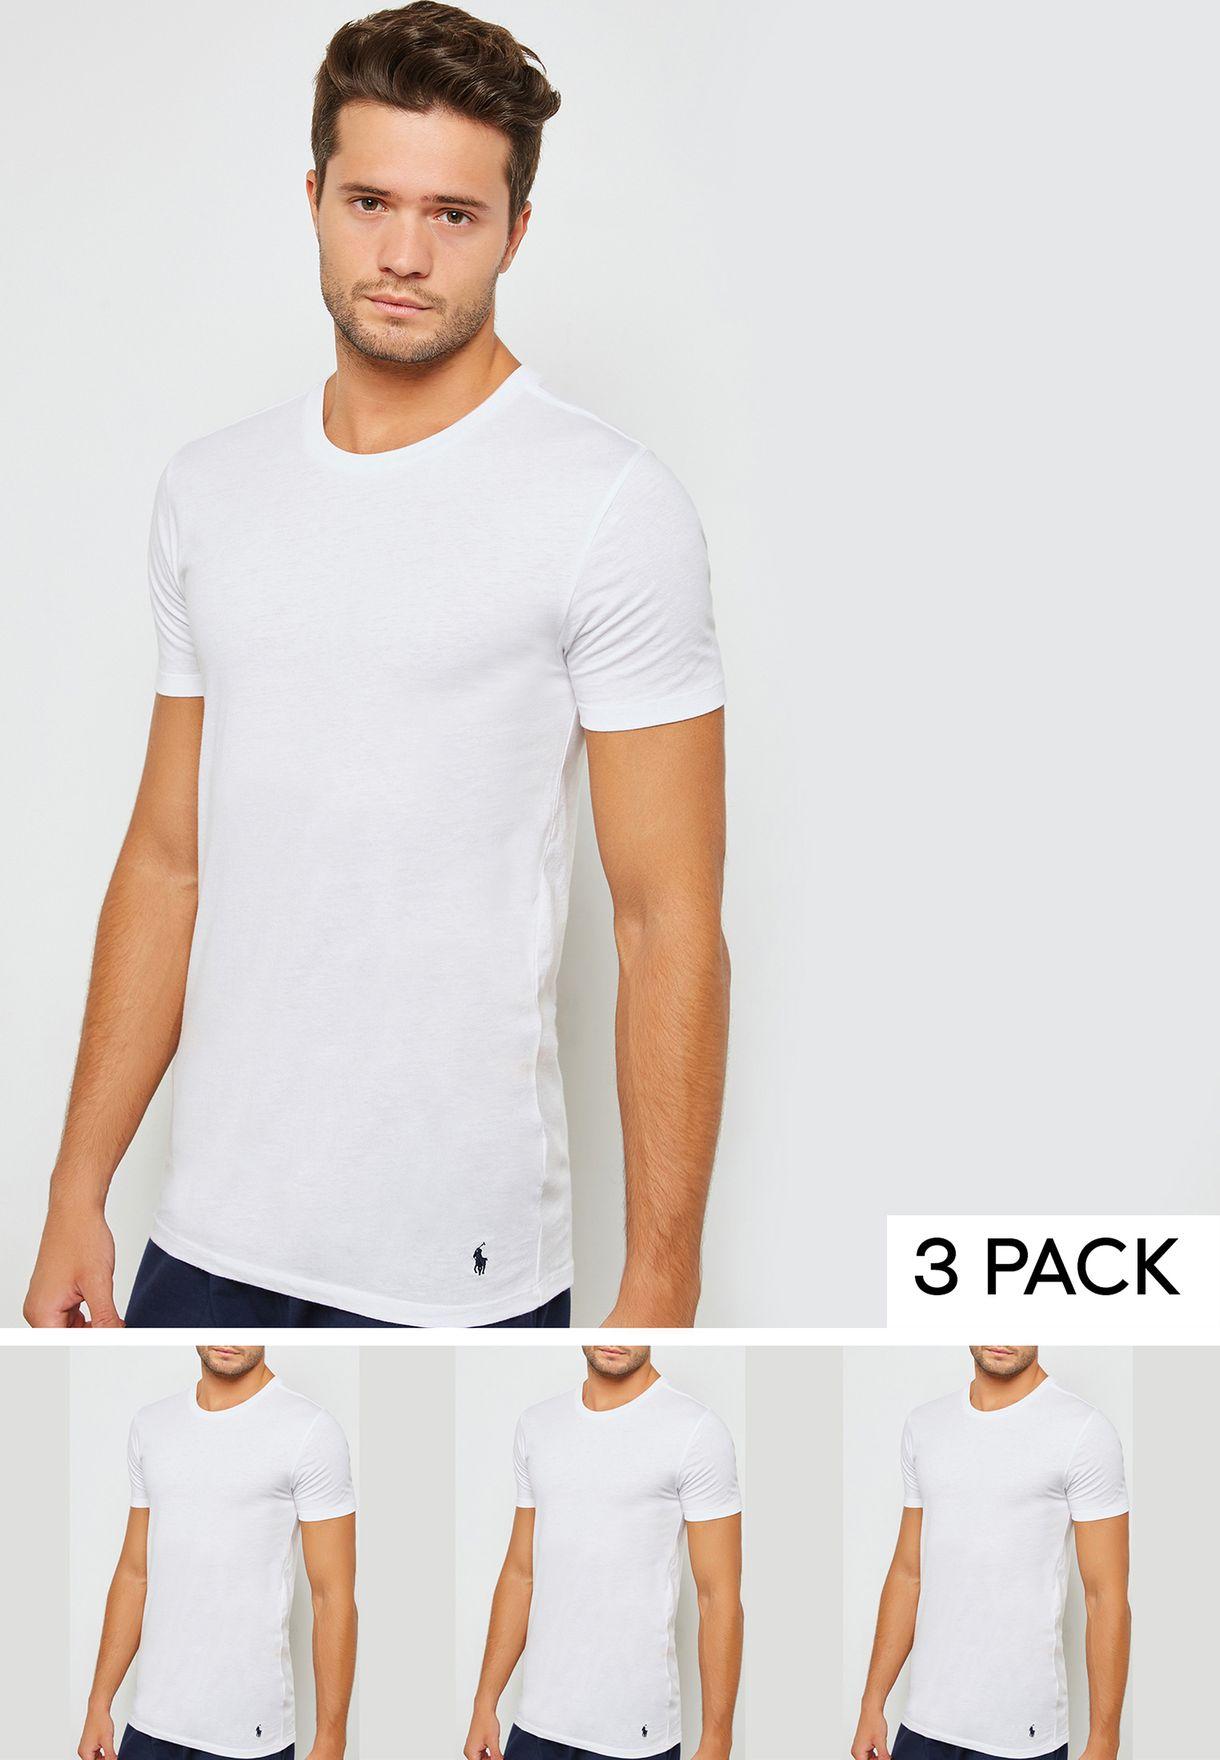 Shop Polo Ralph Lauren white 3 Pack T-Shirt 714709274002 for Men in ... bf5972c274f